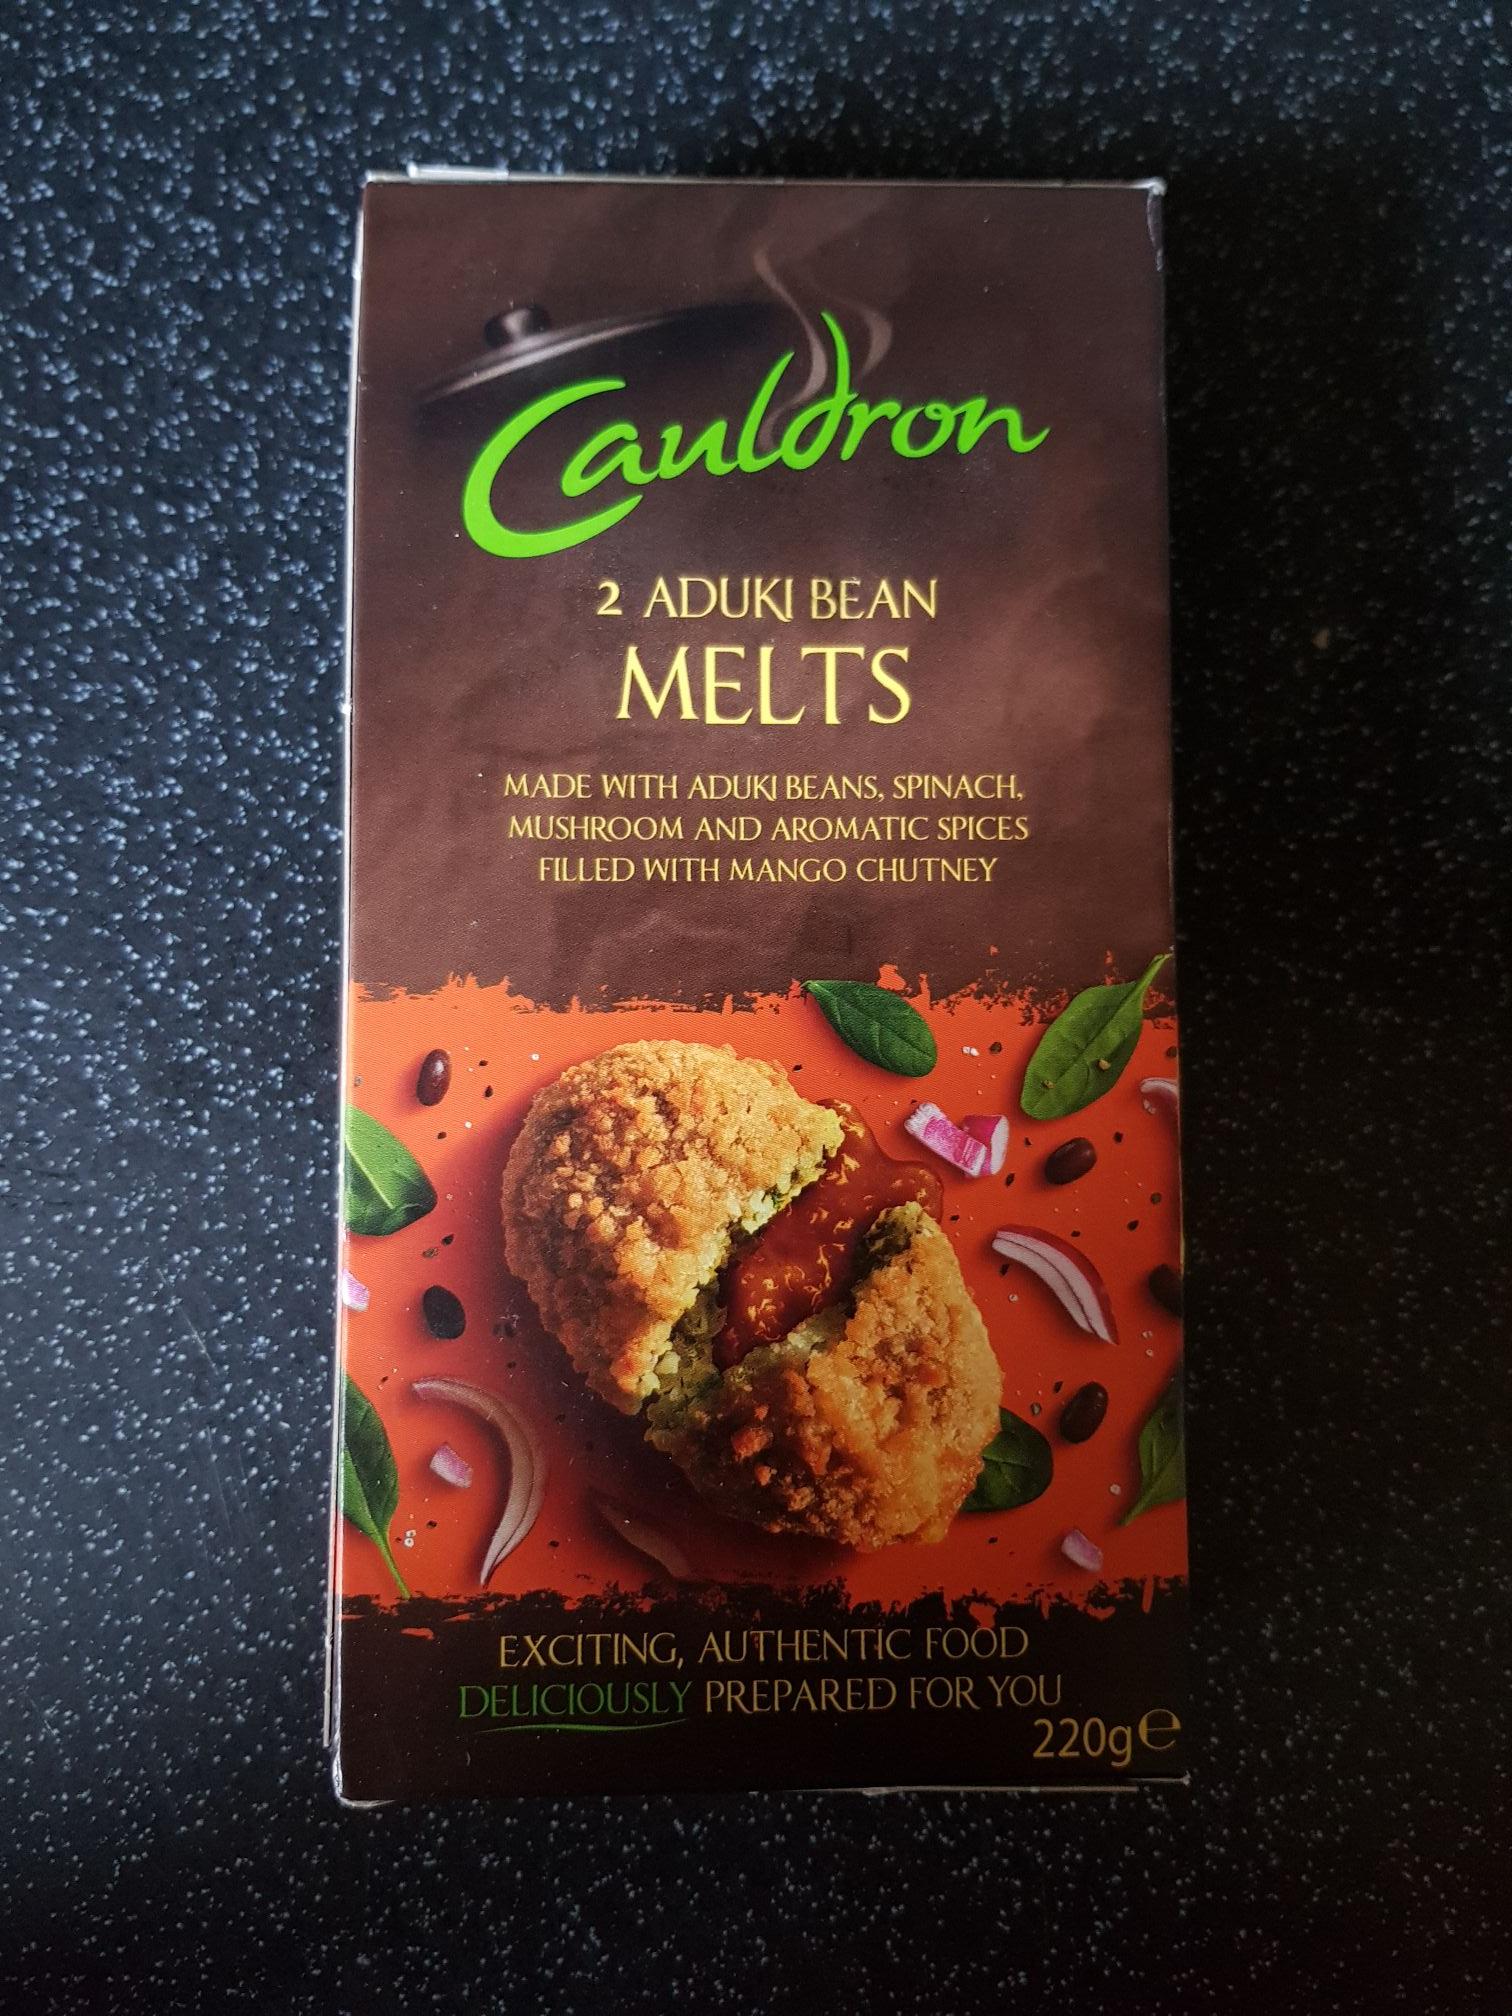 Heron Foods - Cauldron Aduki Bean Melts pack of 2 - 79p (Blackburn)